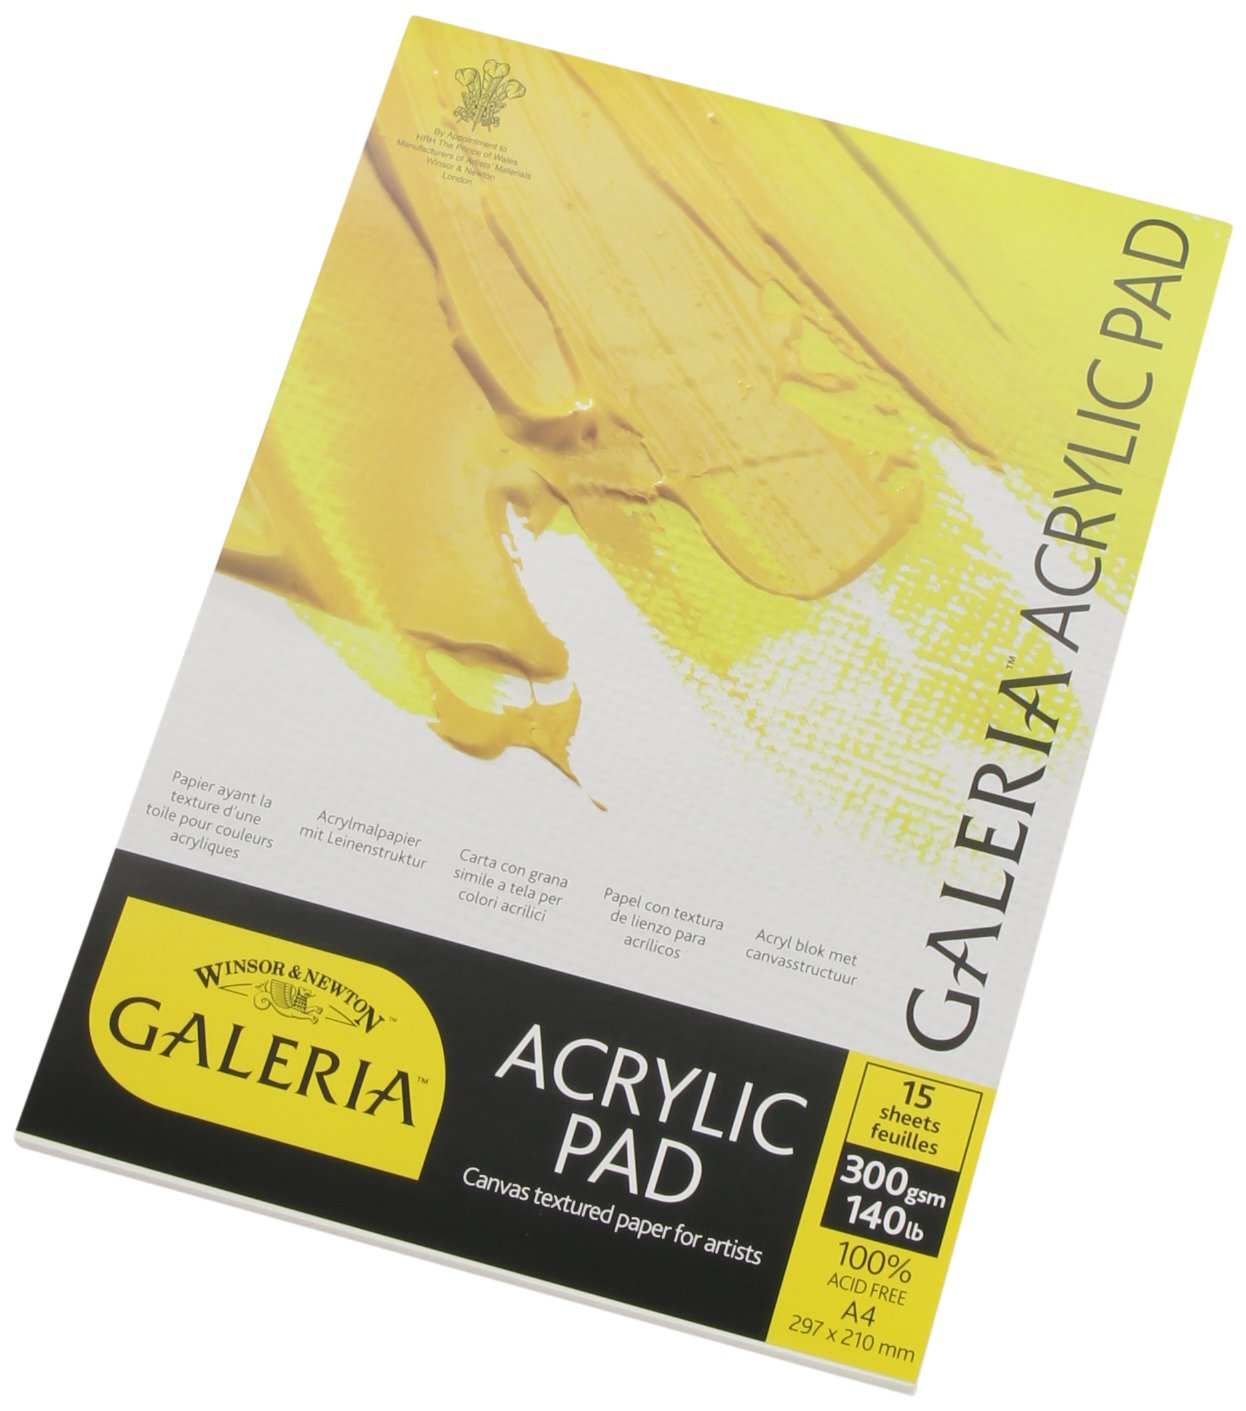 Winsor /& Newton 16x2 Galeria Acrylic Paper Pad